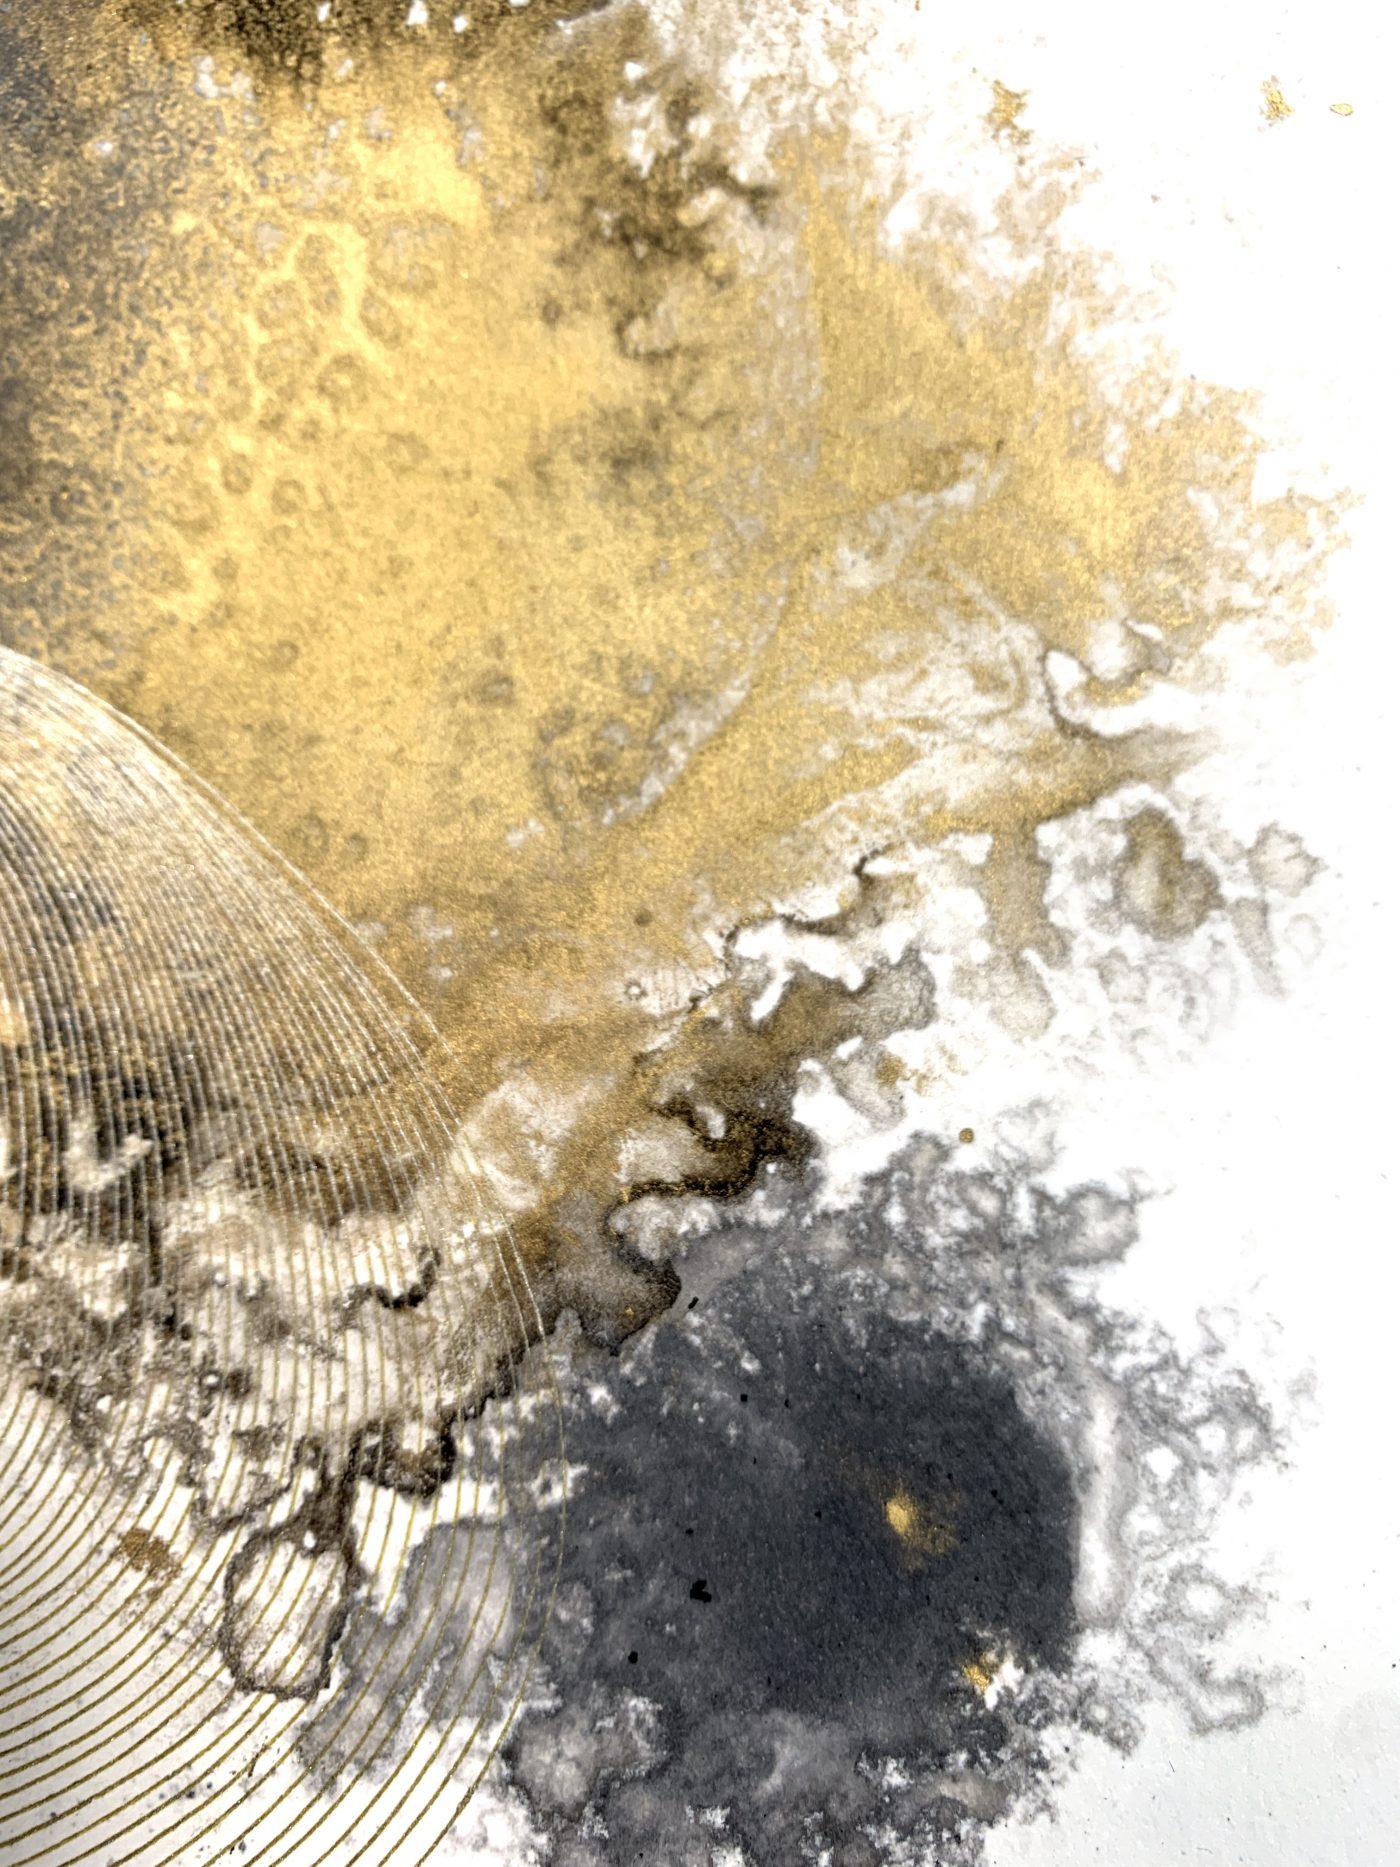 x396 - 30 Jan 2021